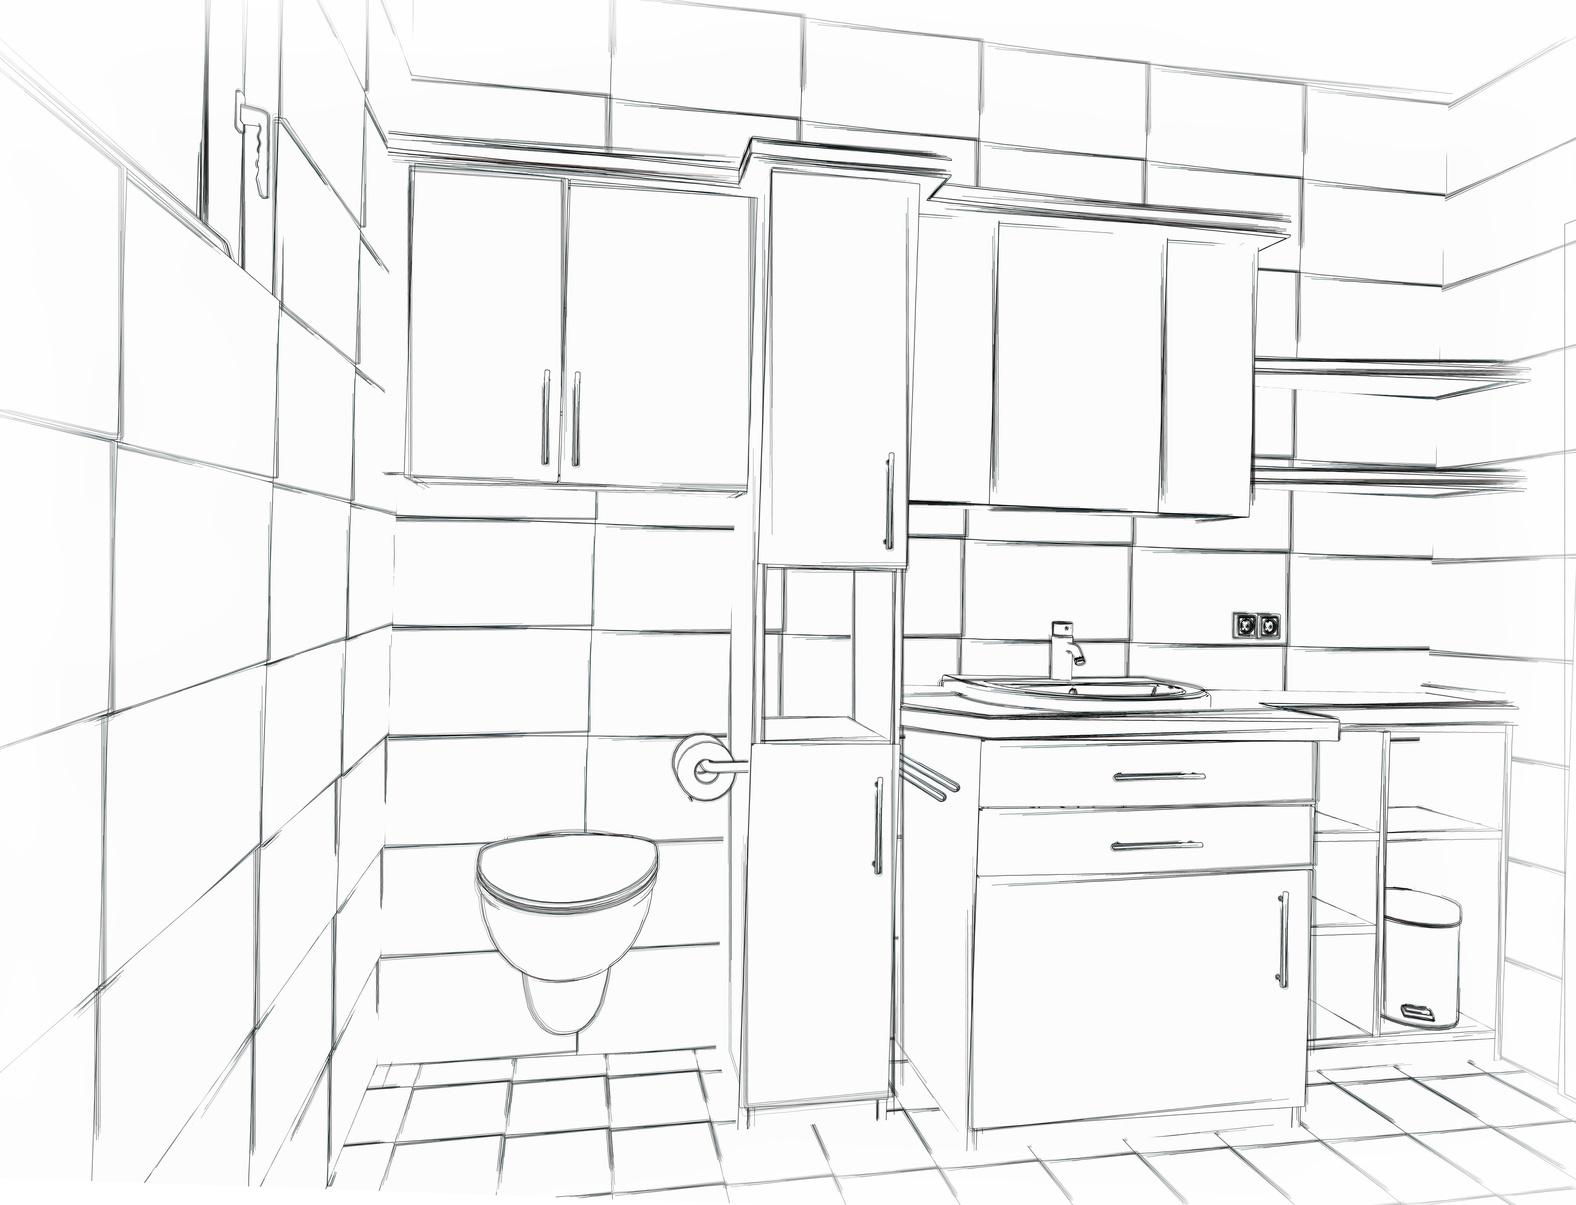 Elektroinstallation Planen  Ratgeber tips frs Badezimmer